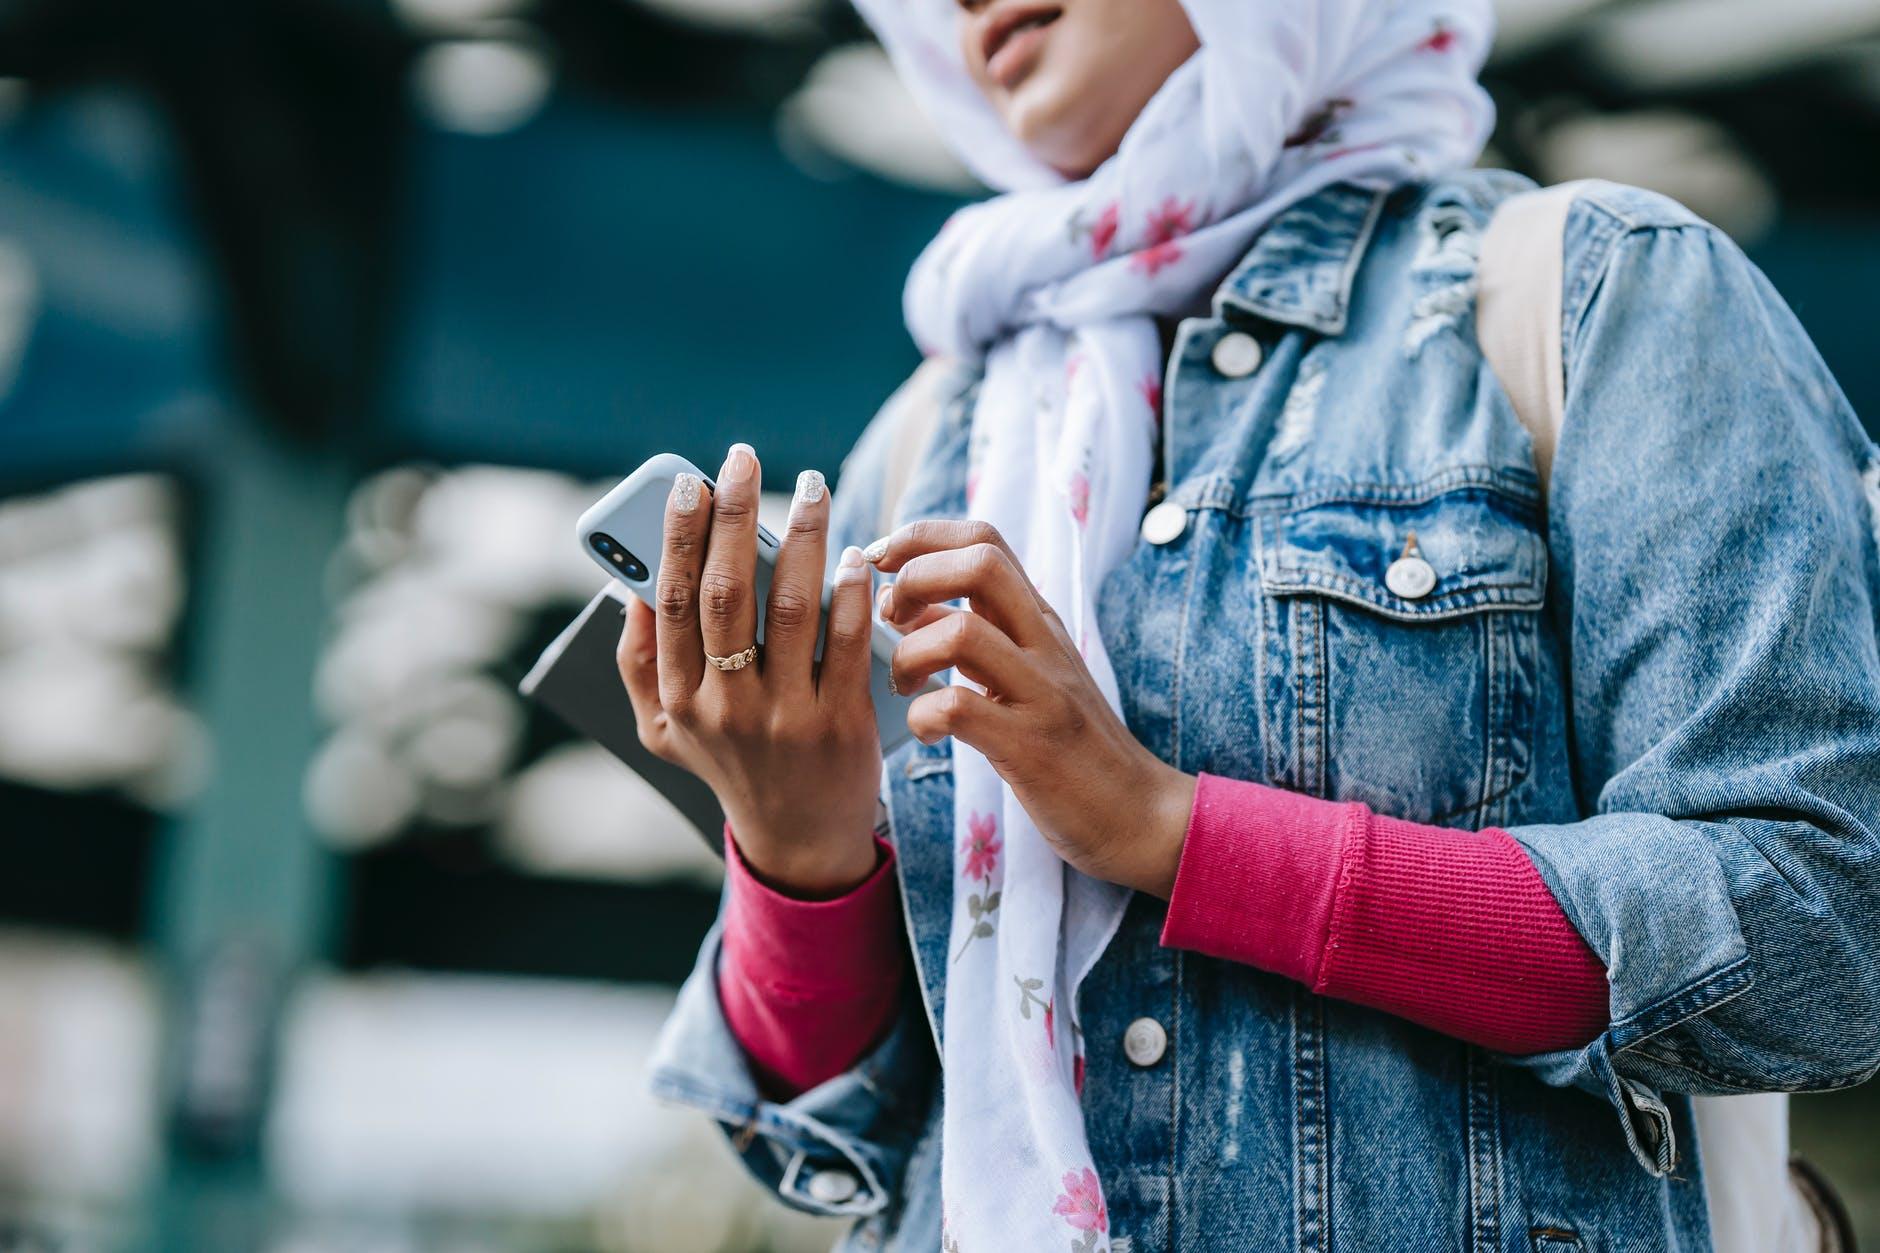 crop ethnic woman surfing smartphone in city street